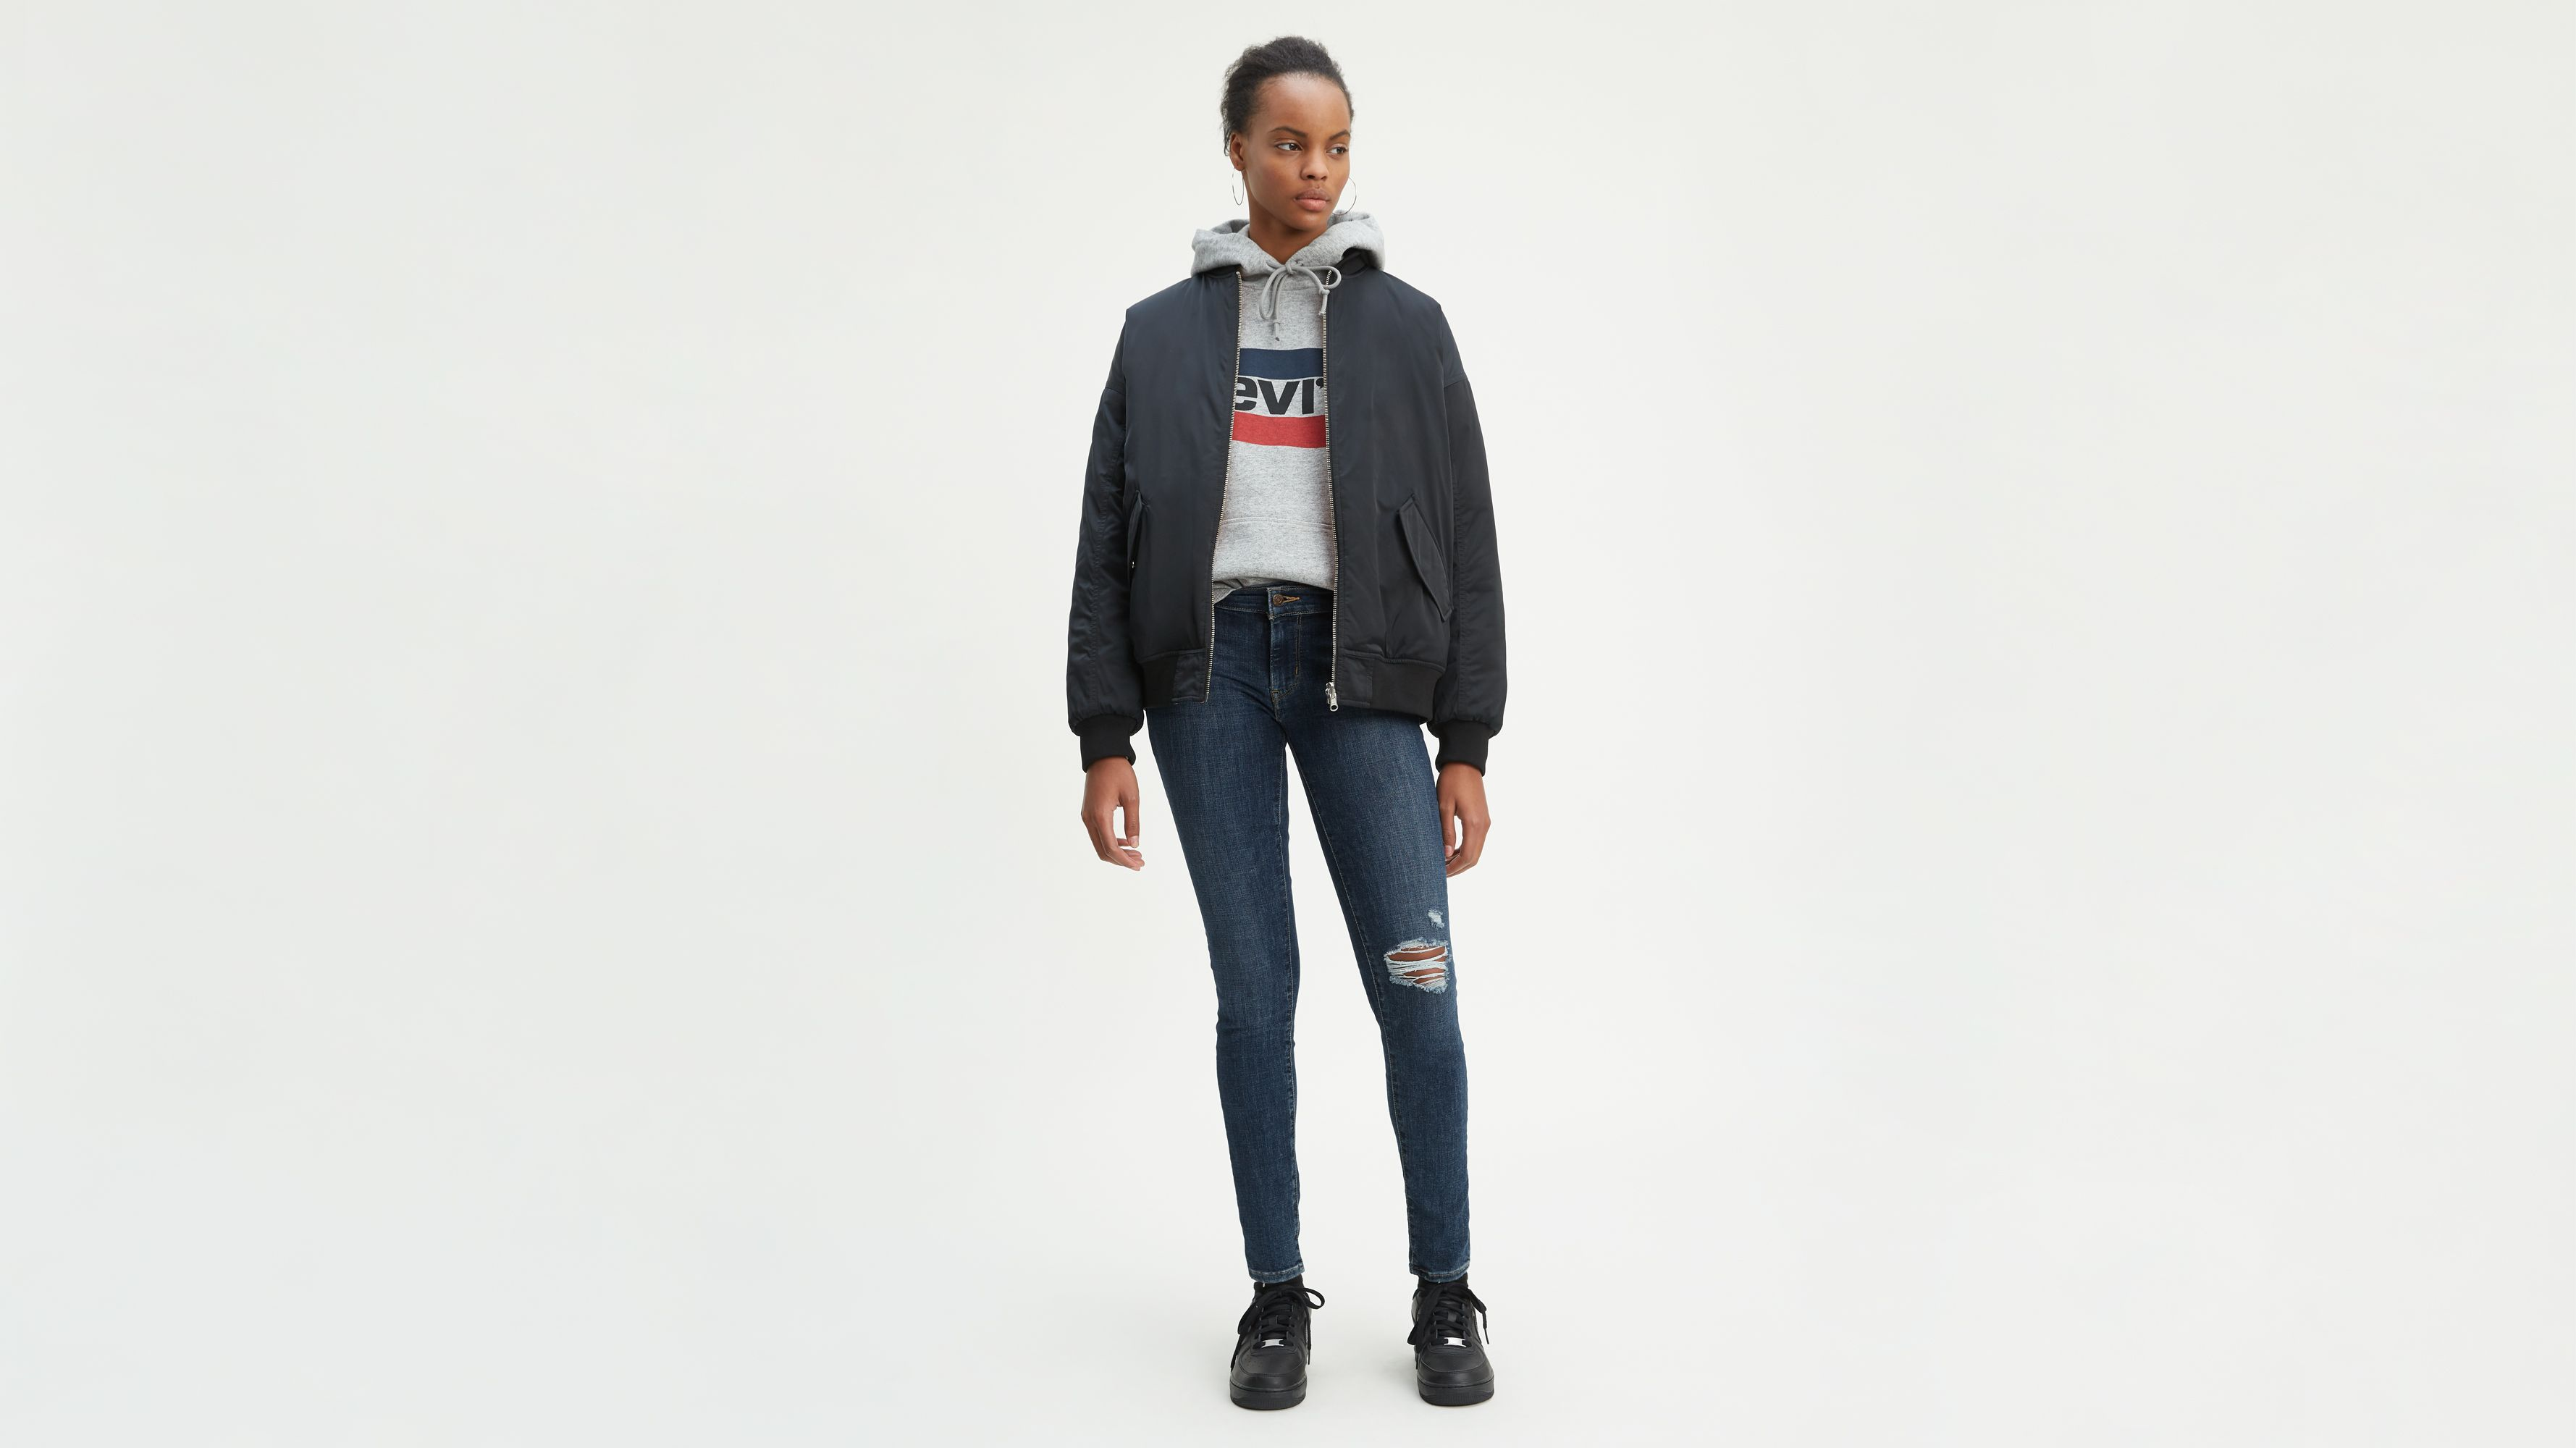 Women-Jeans-710 Super Skinny Jeans-Just Sayin